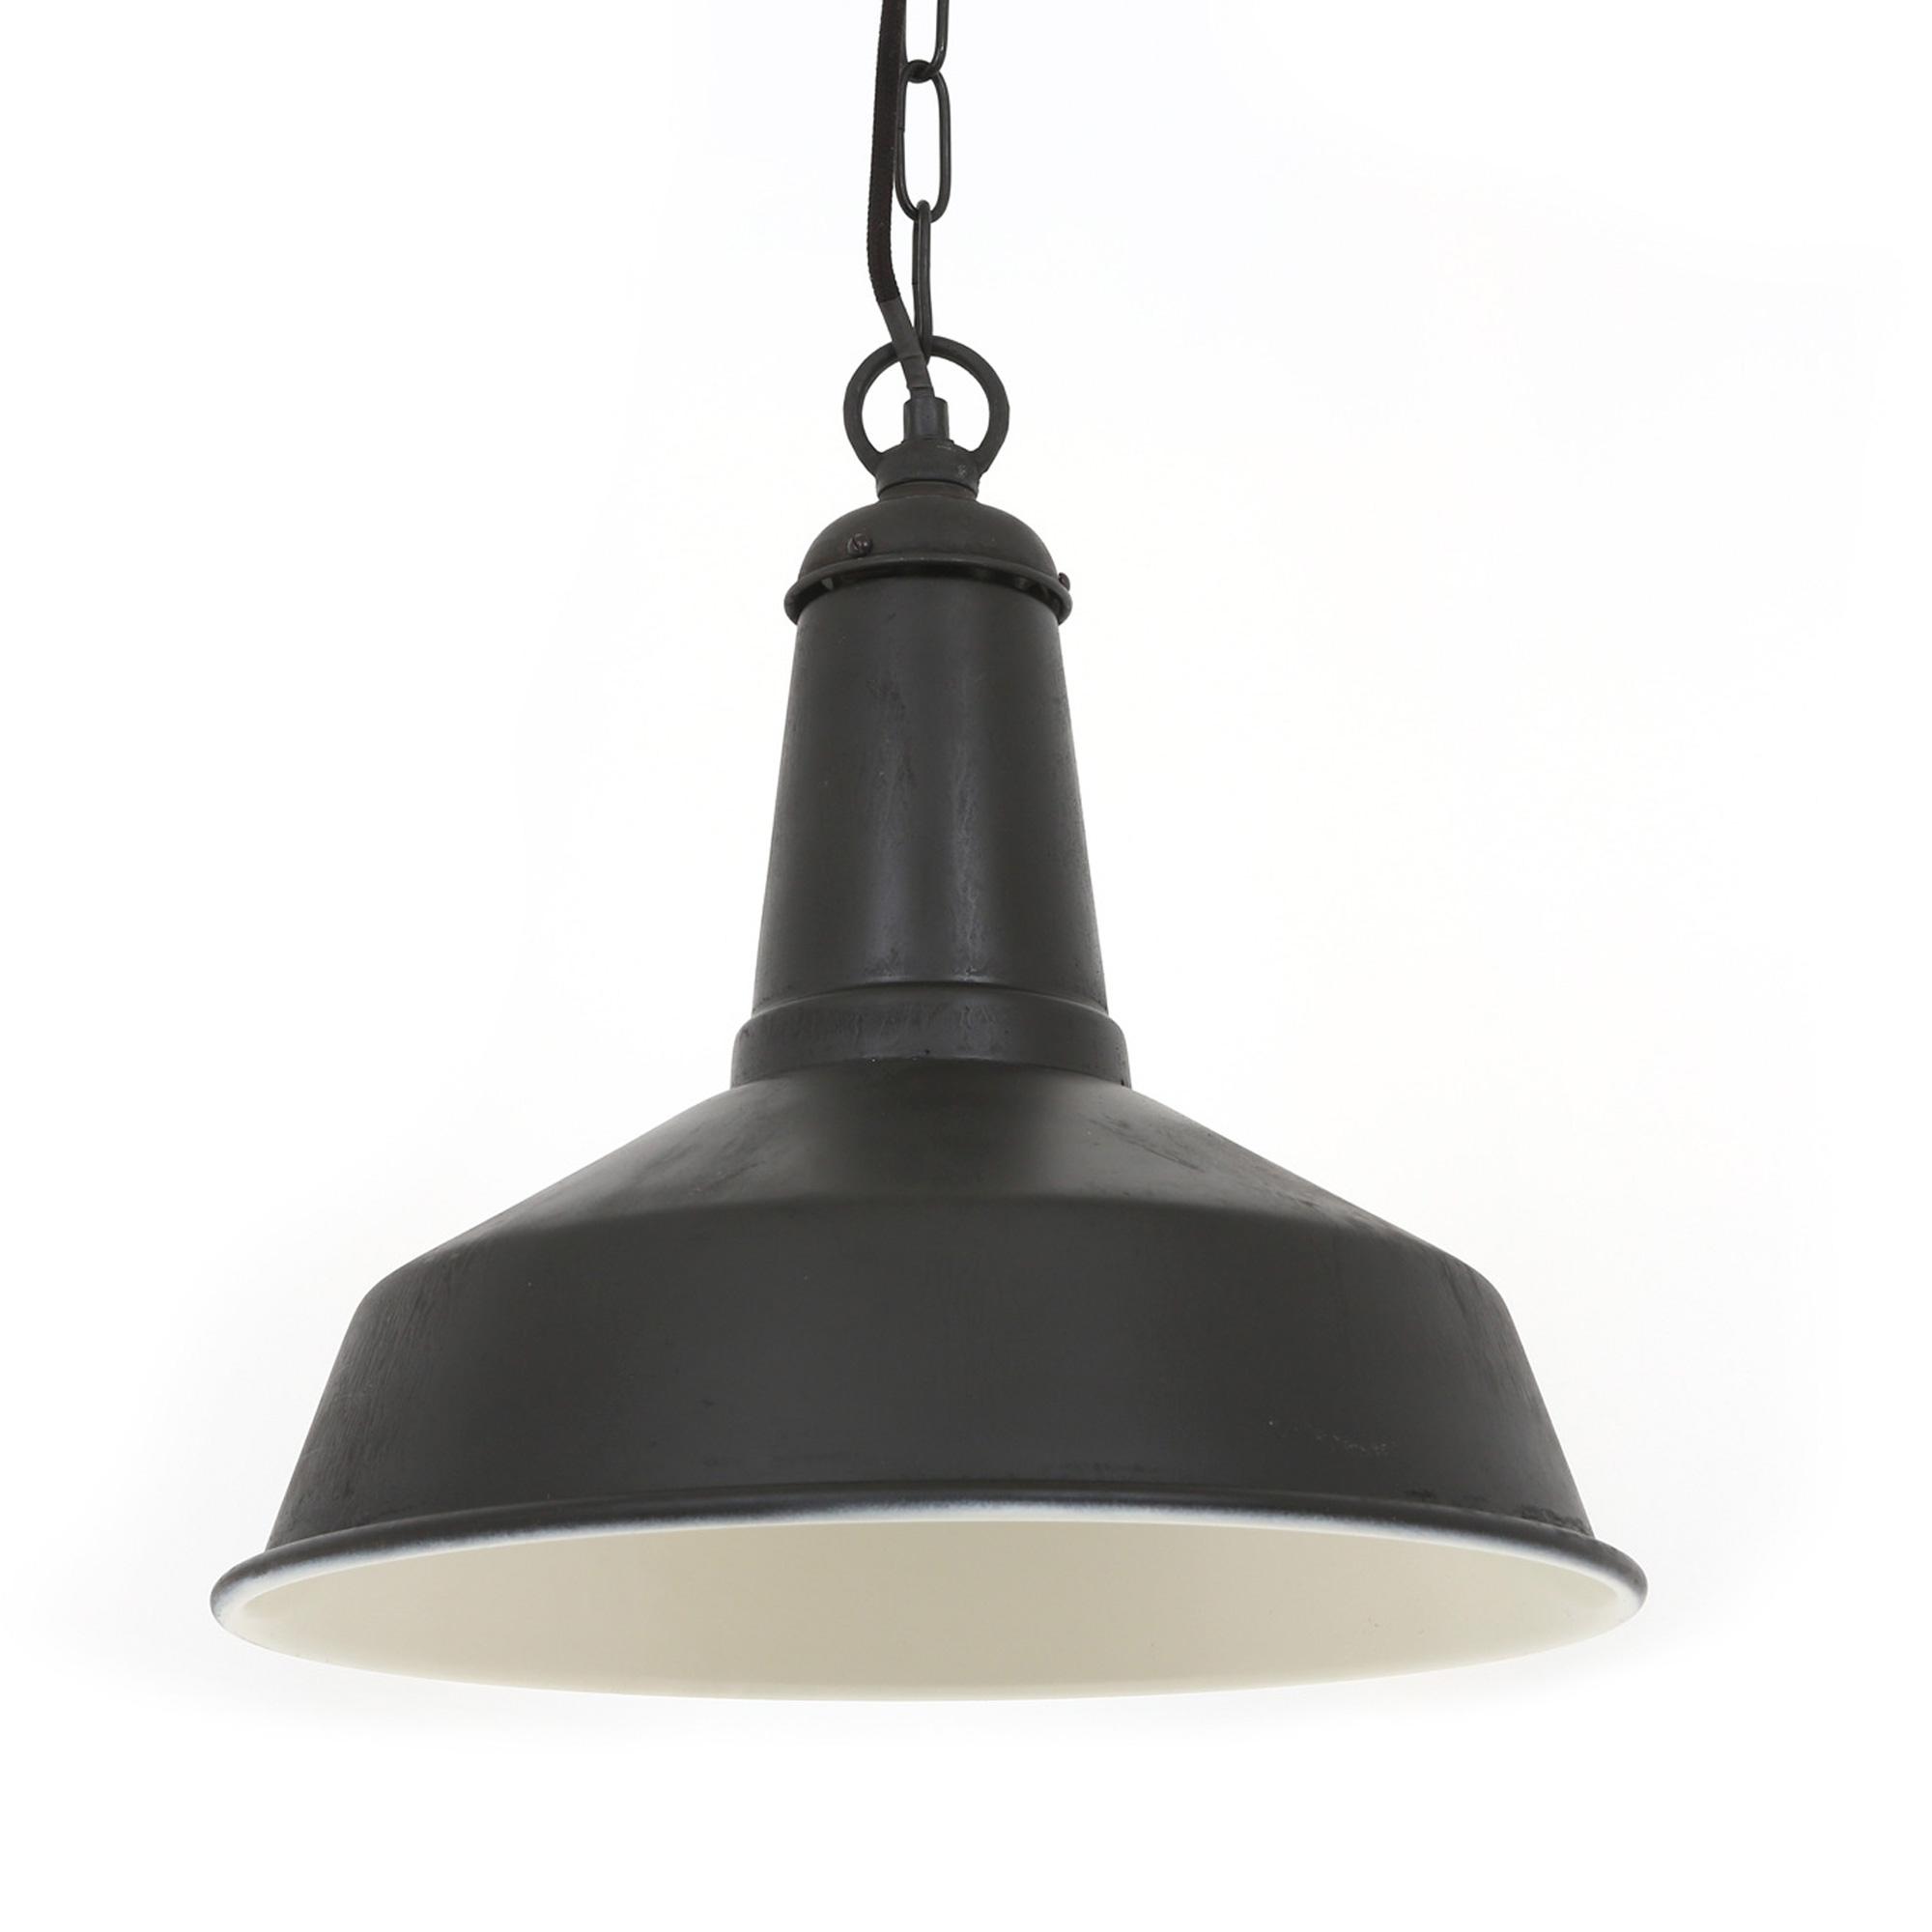 Regis Hanglamp